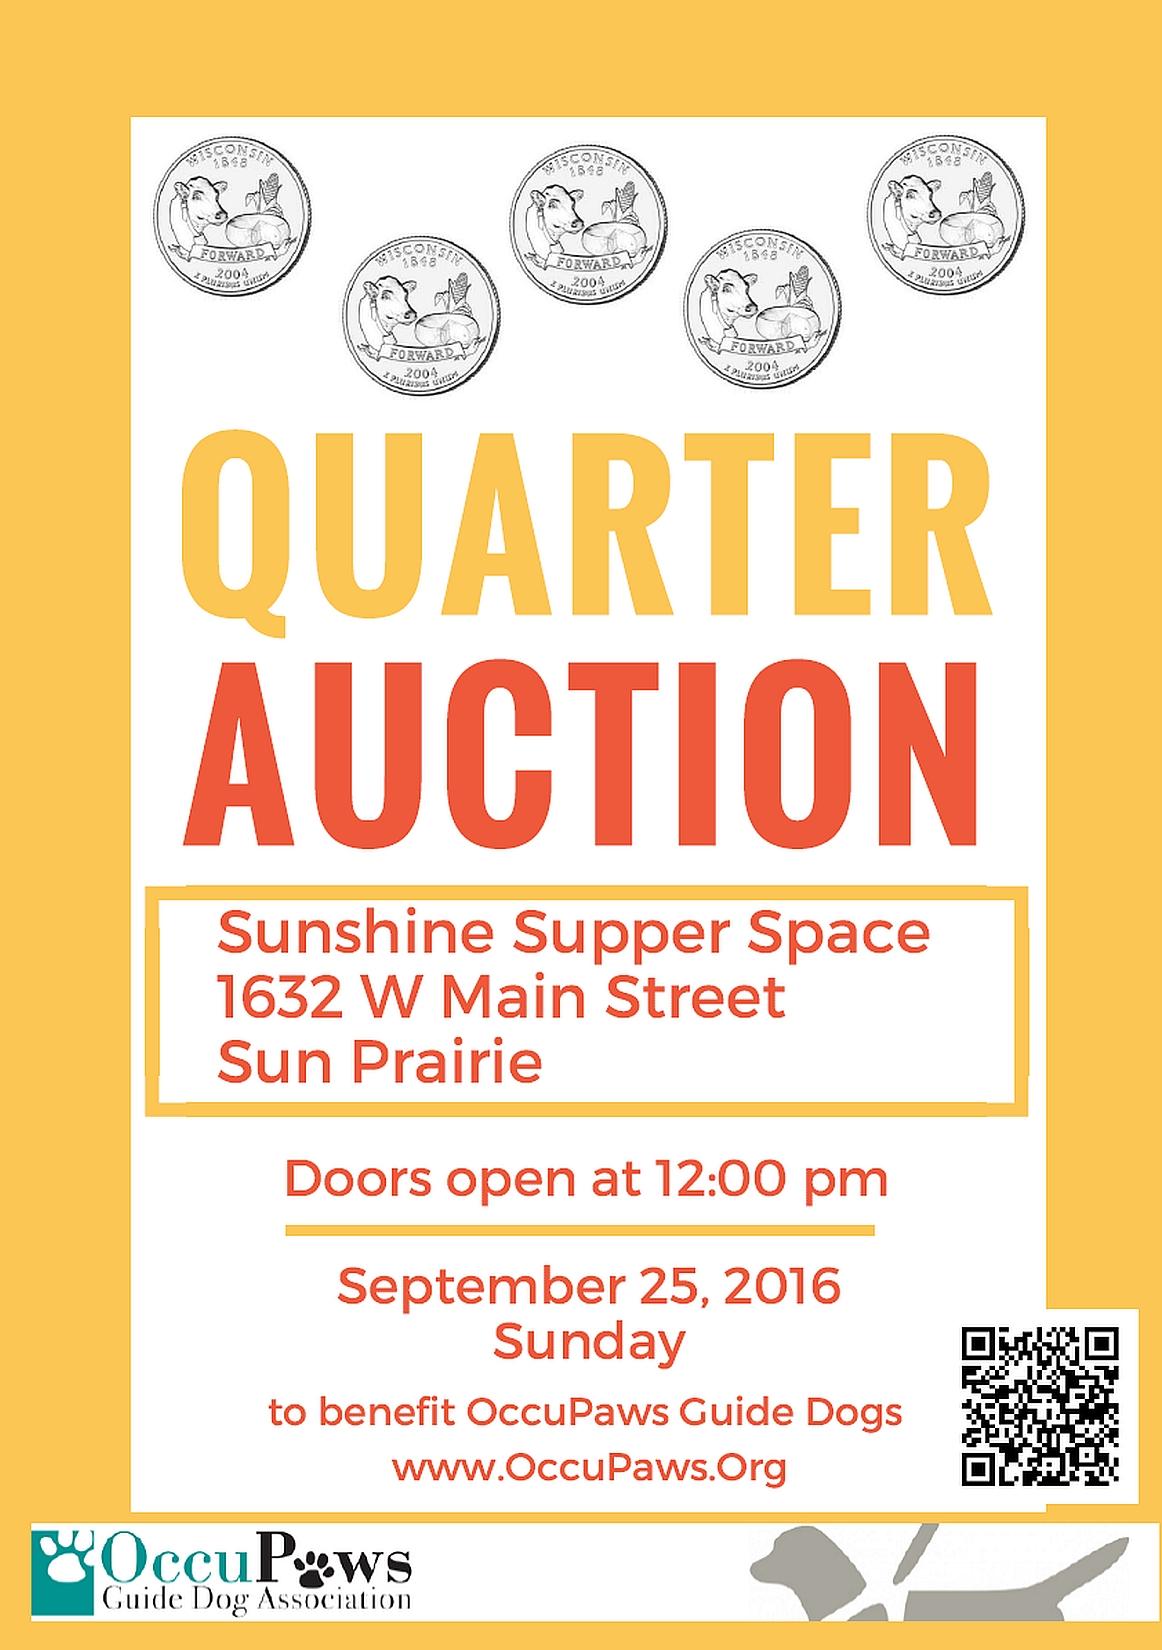 Quarter Auction @ Sunshine Supper Place | Sun Prairie | Wisconsin | United States